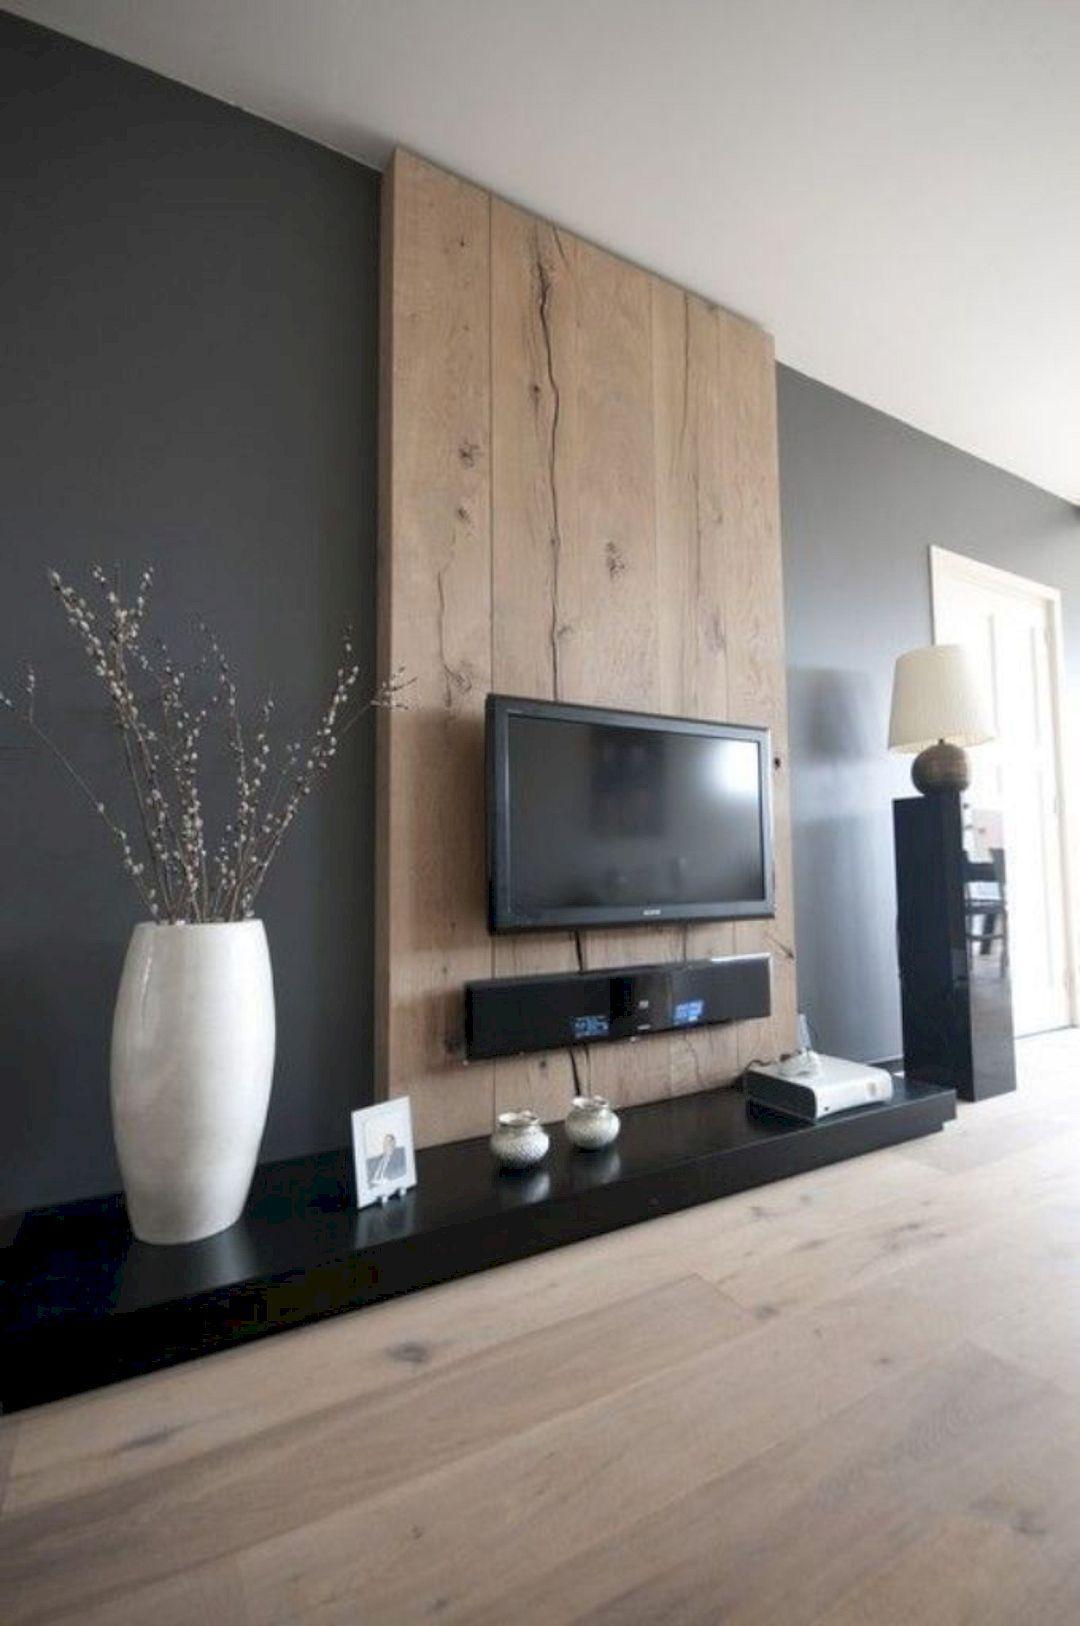 16 Interior Design Ideas for LED TV | Pinterest | Interiors, Tv ...